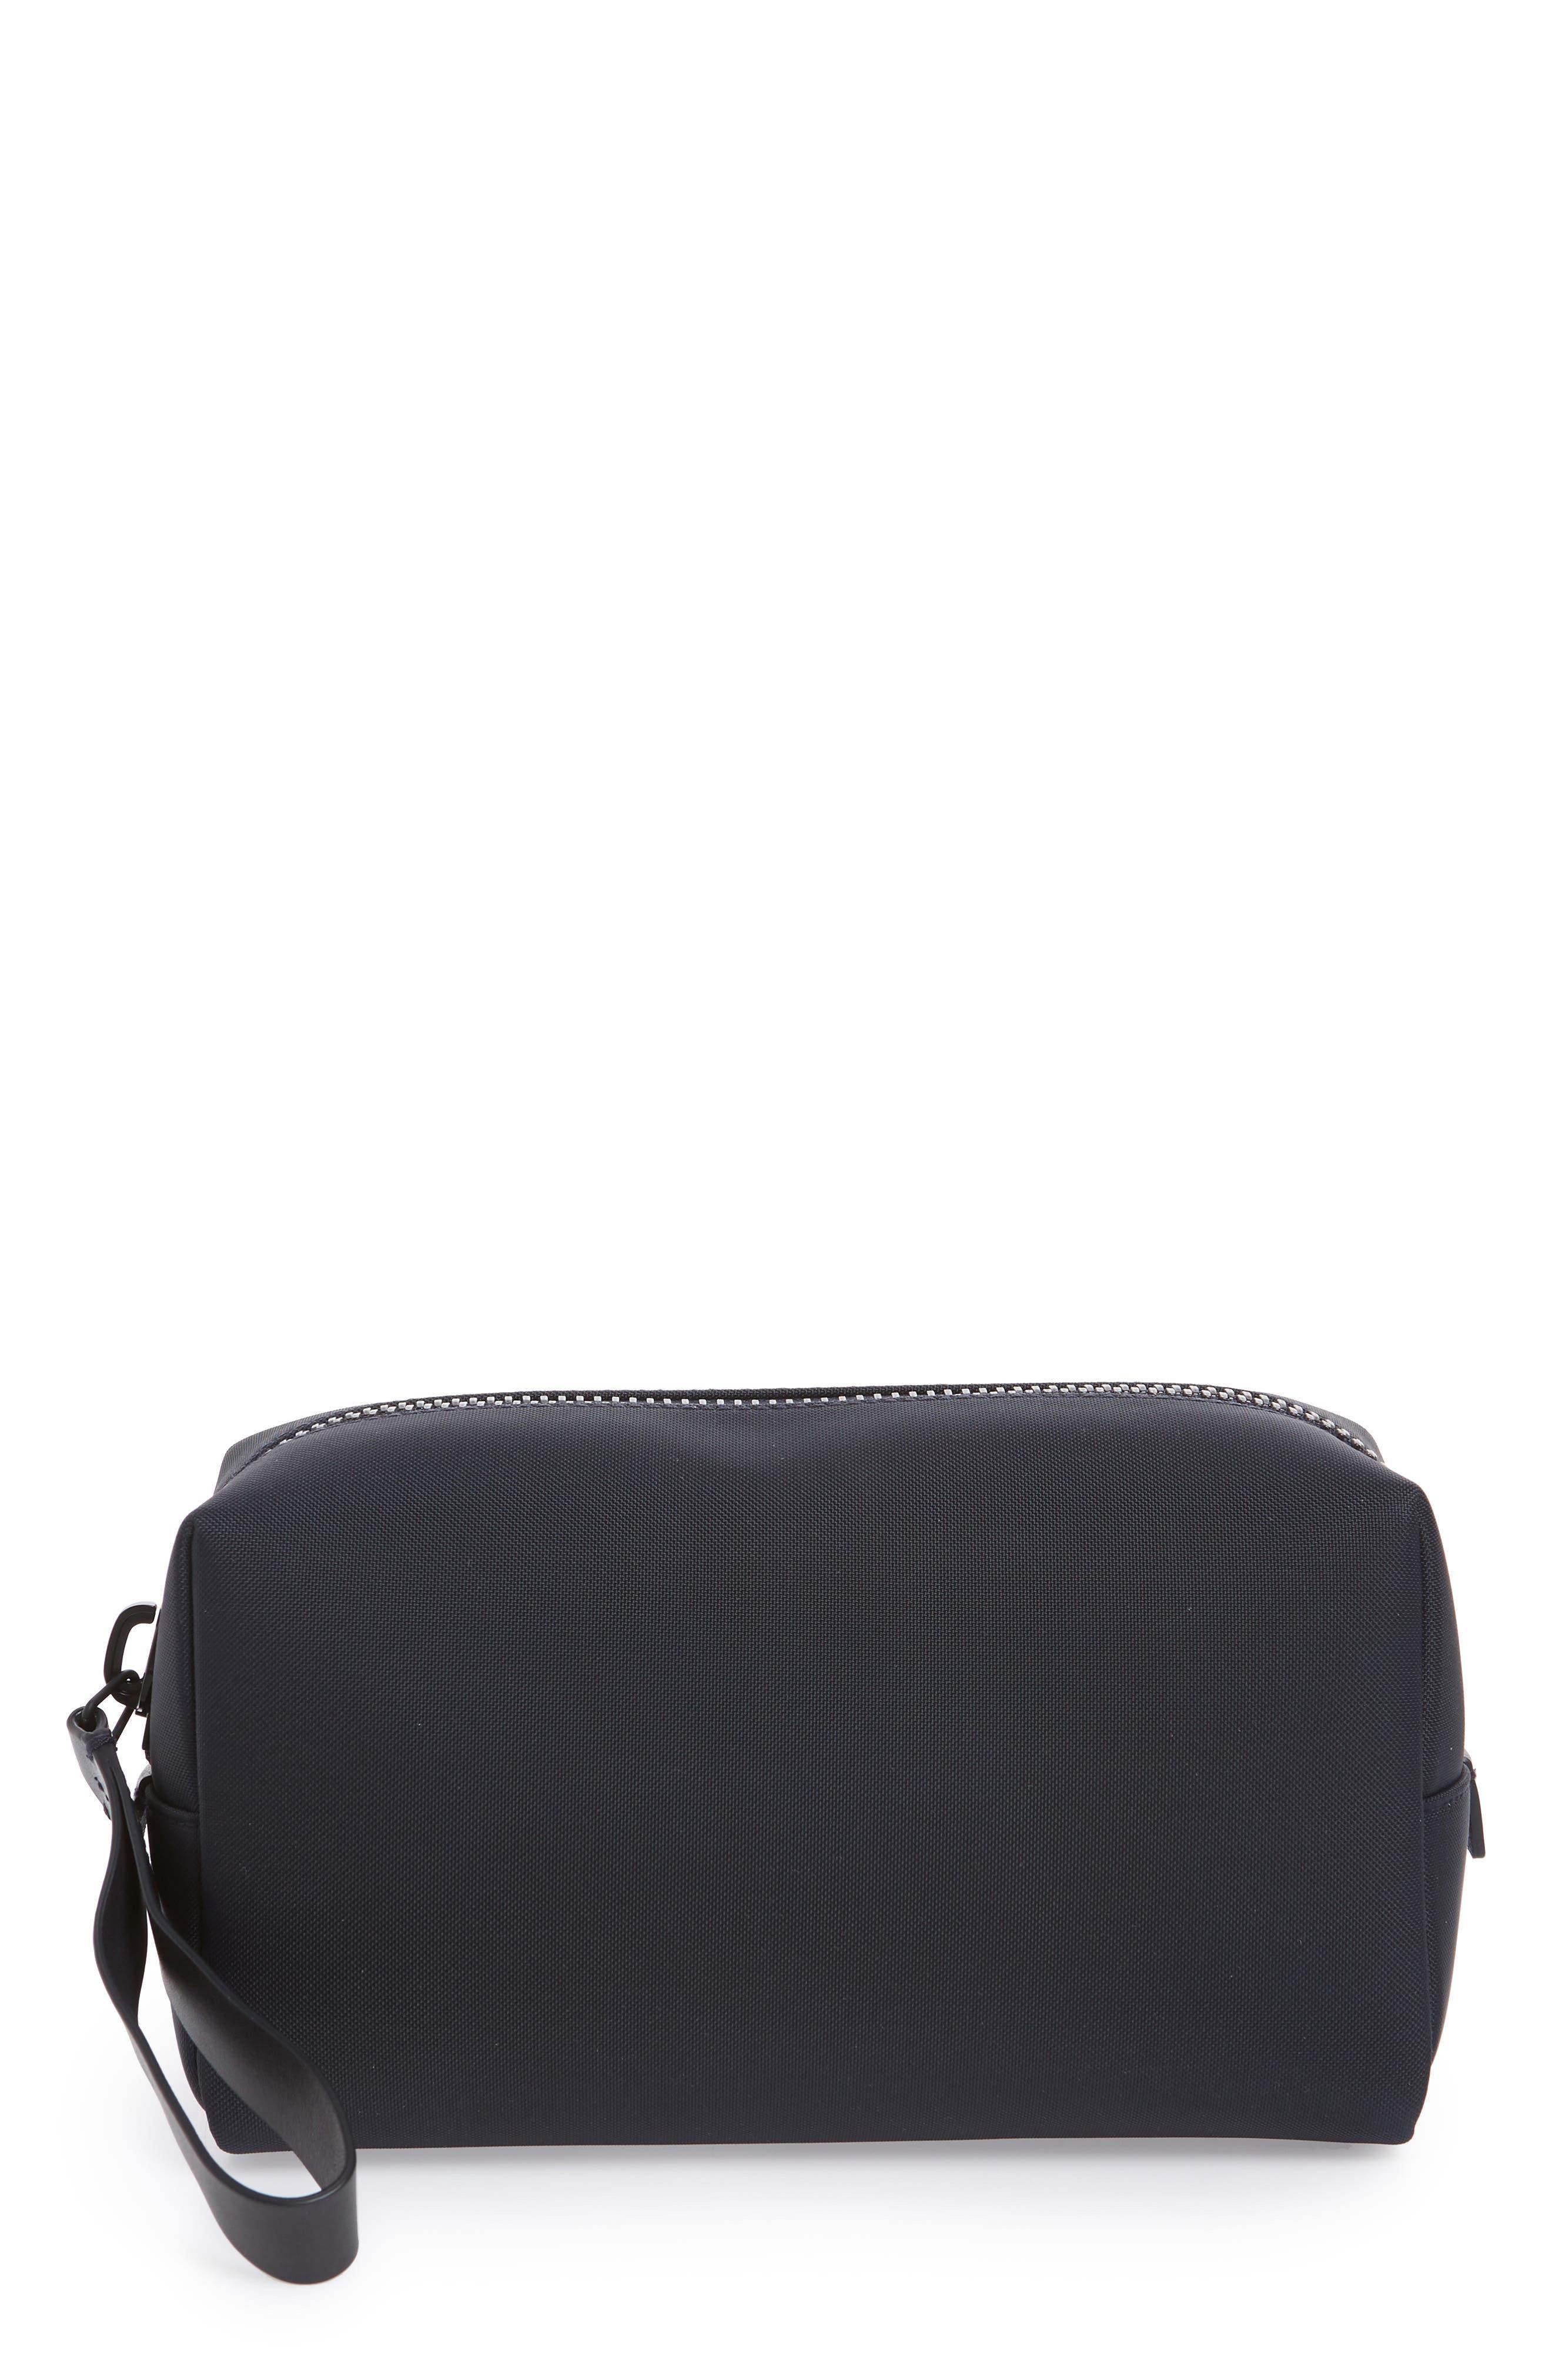 TROUBADOUR Nylon Dopp Kit in Navy Nylon/ Navy Leather